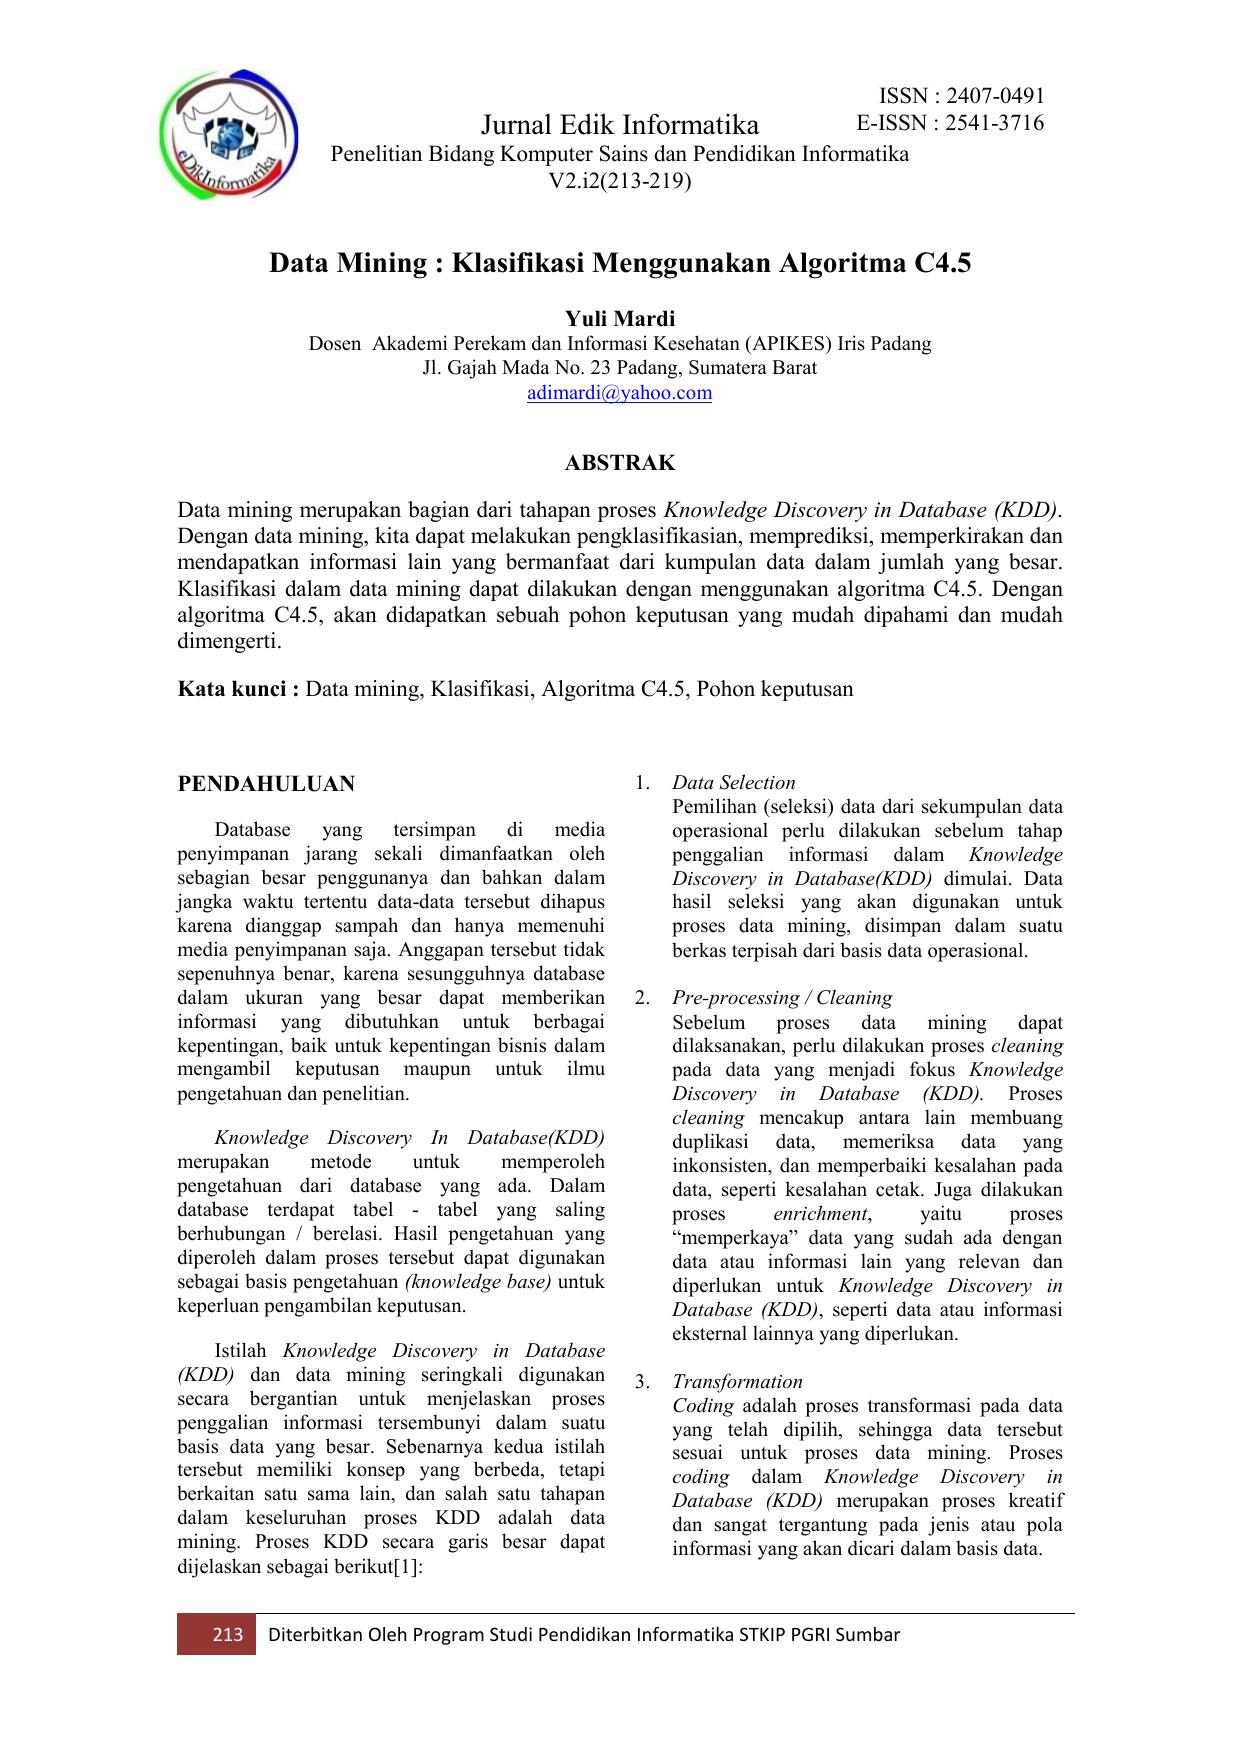 Jurnal Edik Informatika Data Mining Klasifikasi